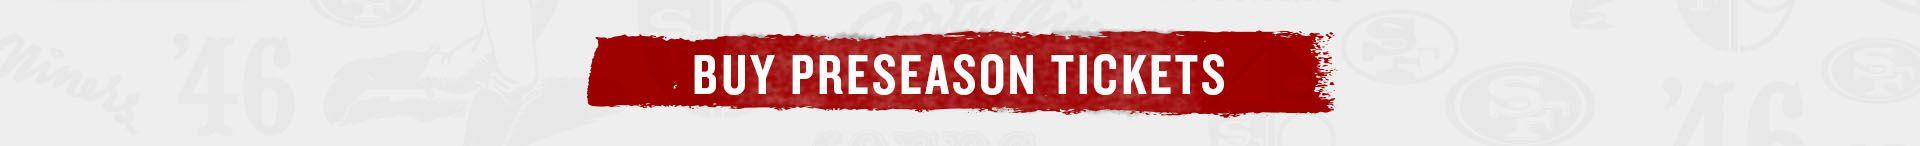 TrainingCamp-Webpage-Preseason Tickets